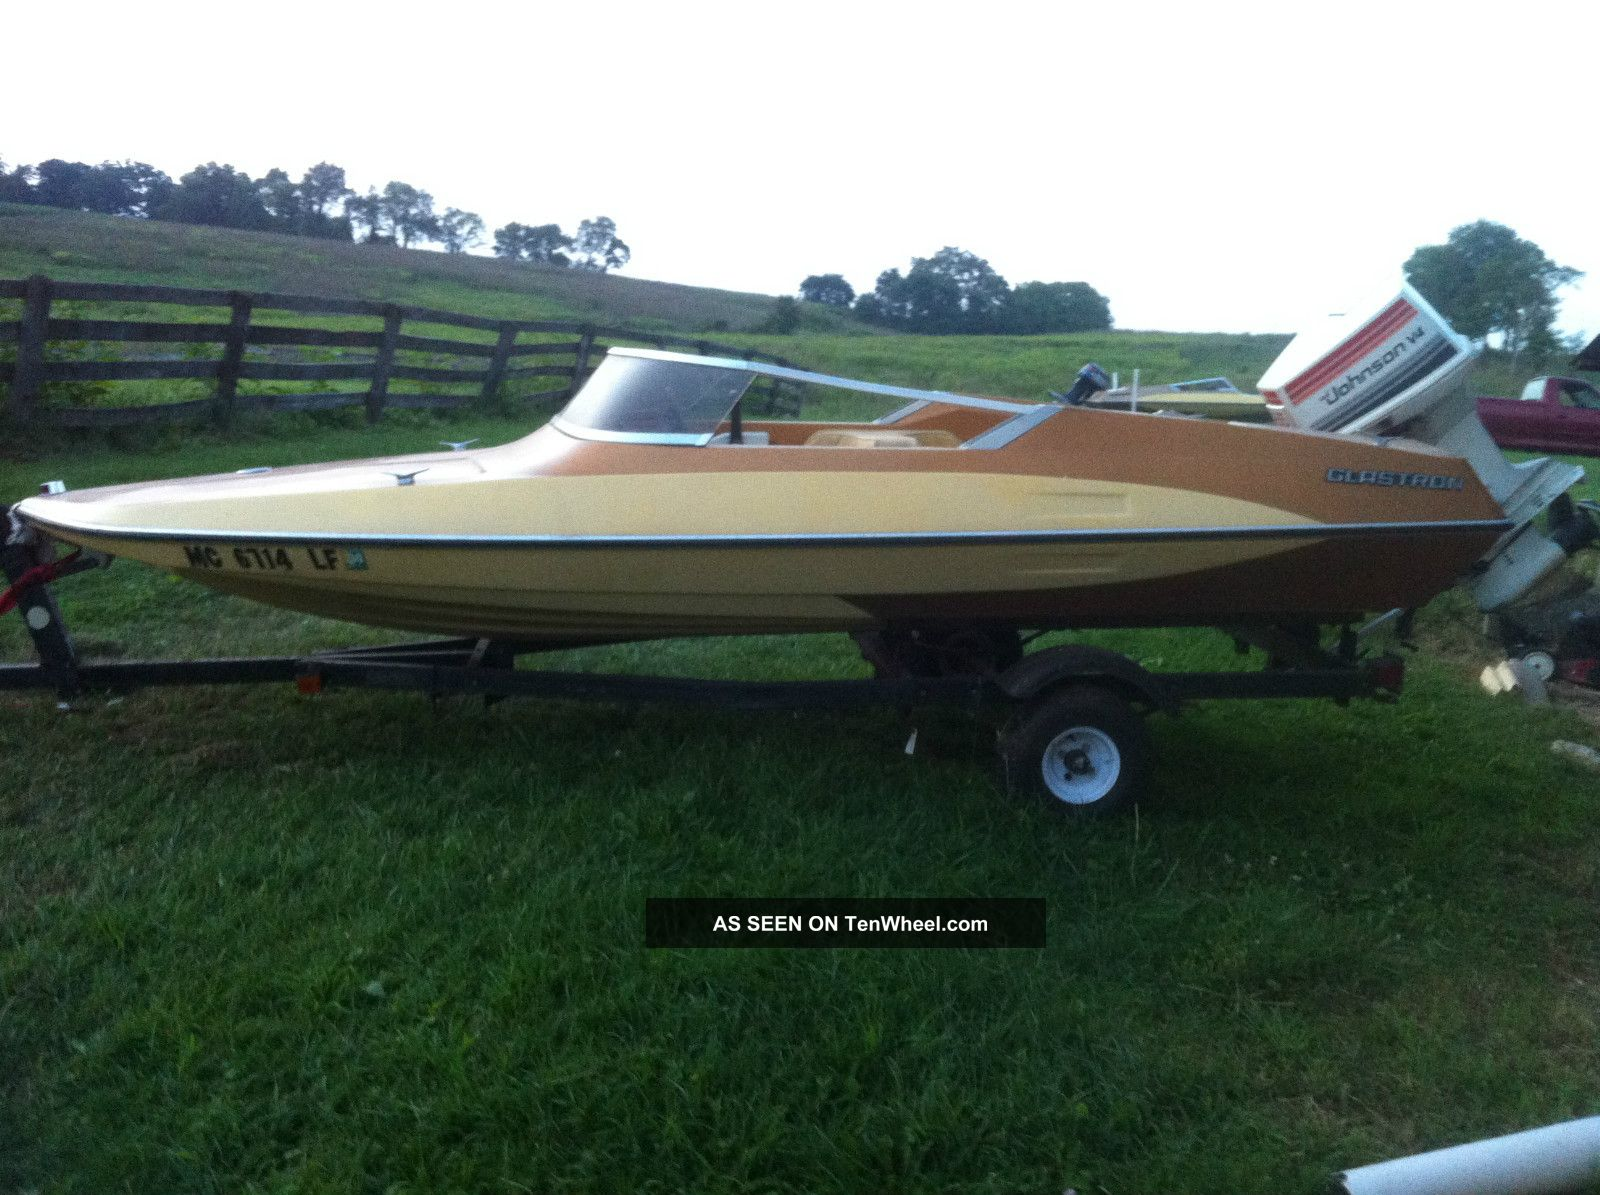 1980 Glastron Gt - 150 Ski / Wakeboarding Boats photo